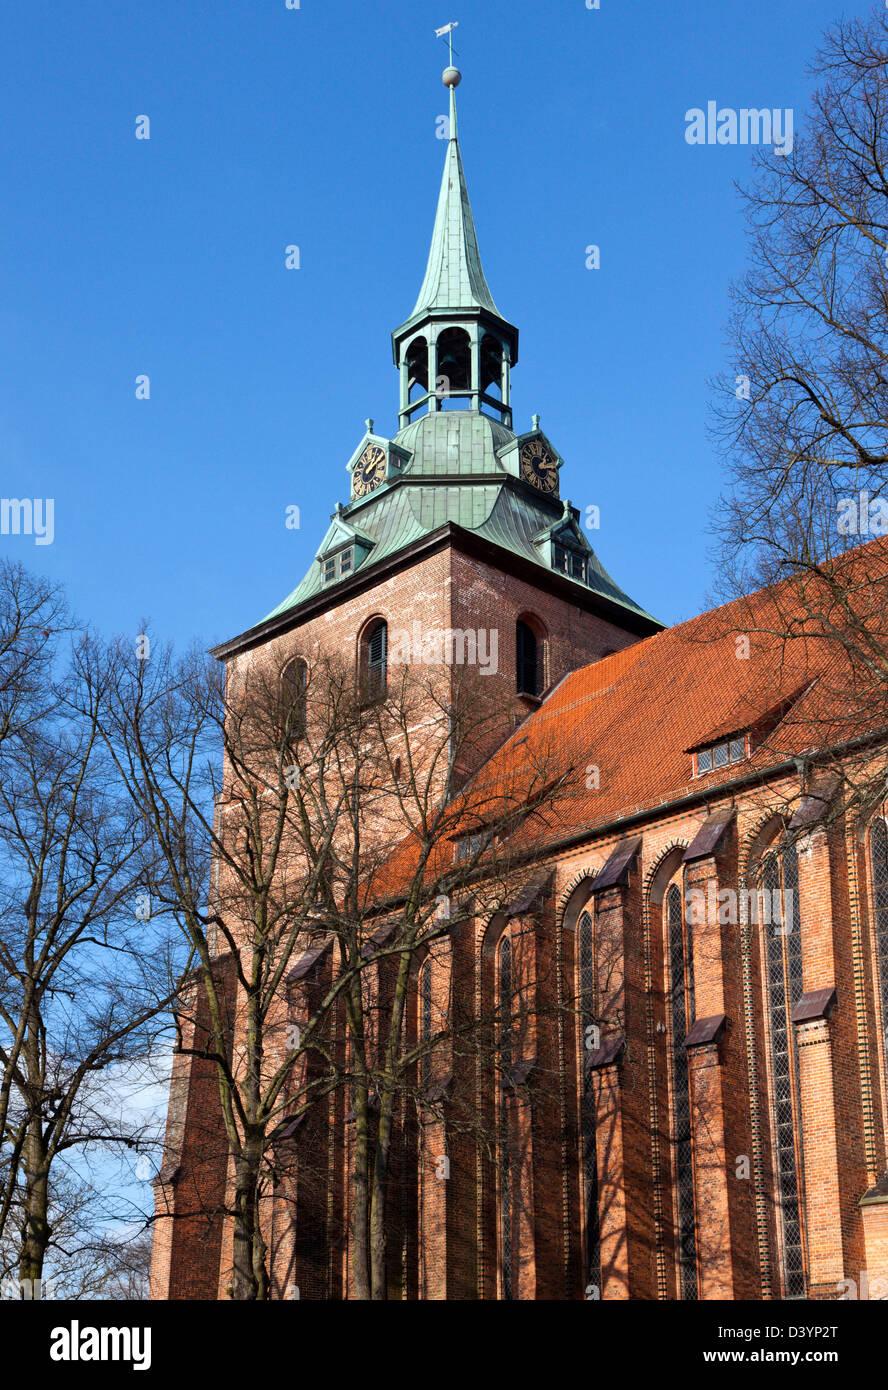 Michaeliskirche Lüneburg - bell tower of gothic church St Michaelis at Luneburg - Stock Image